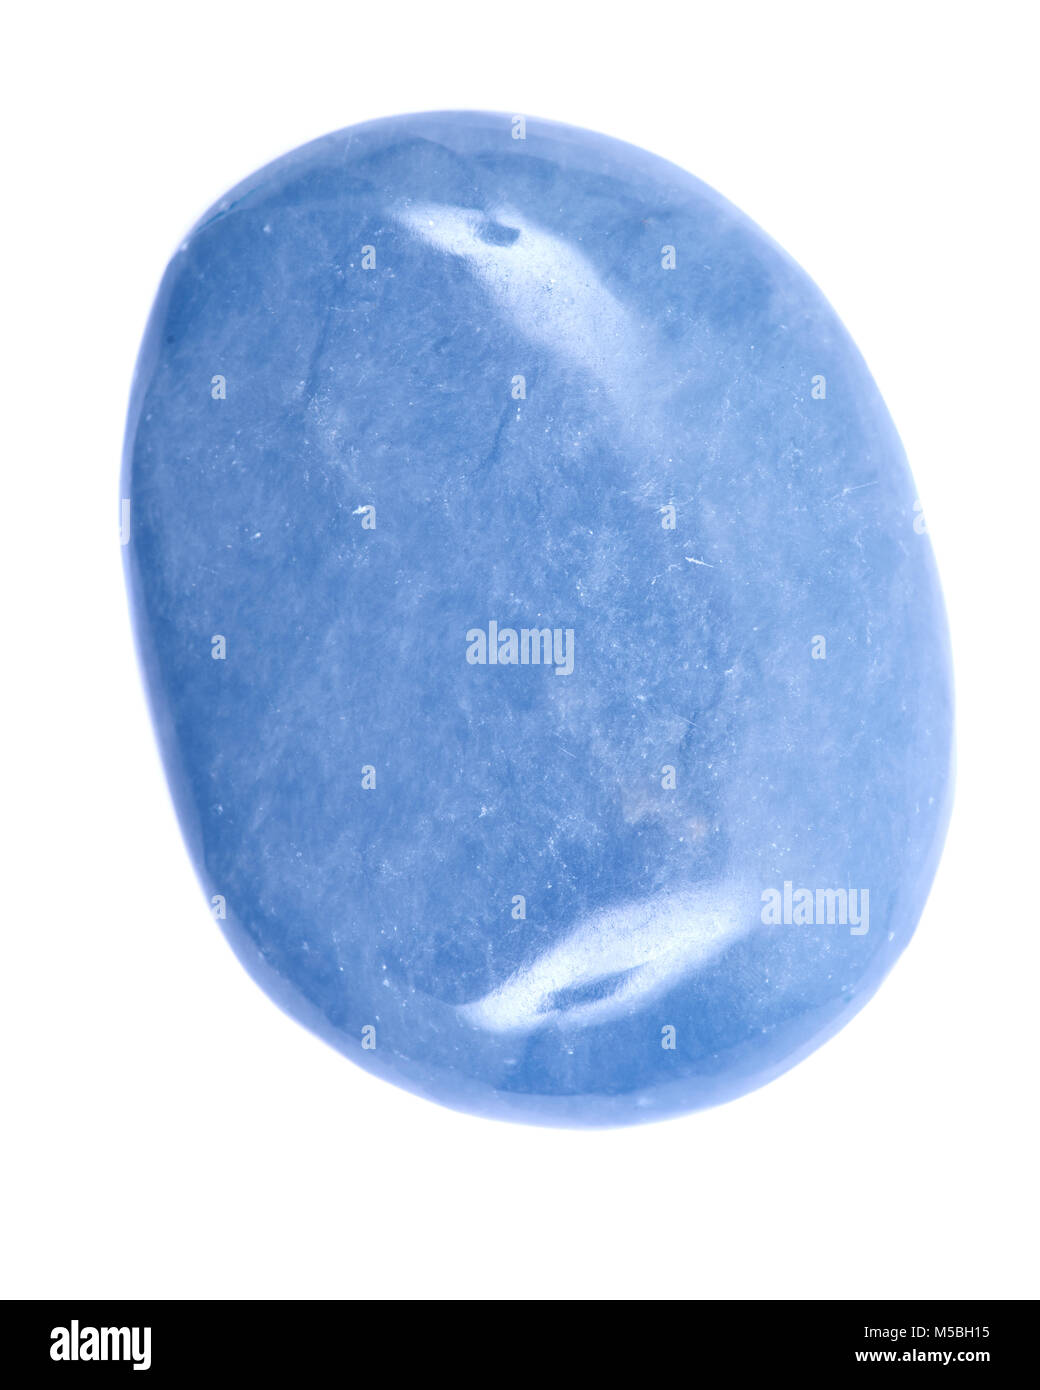 Polished angelite palm stone from Peru isolated on white background - Stock Image